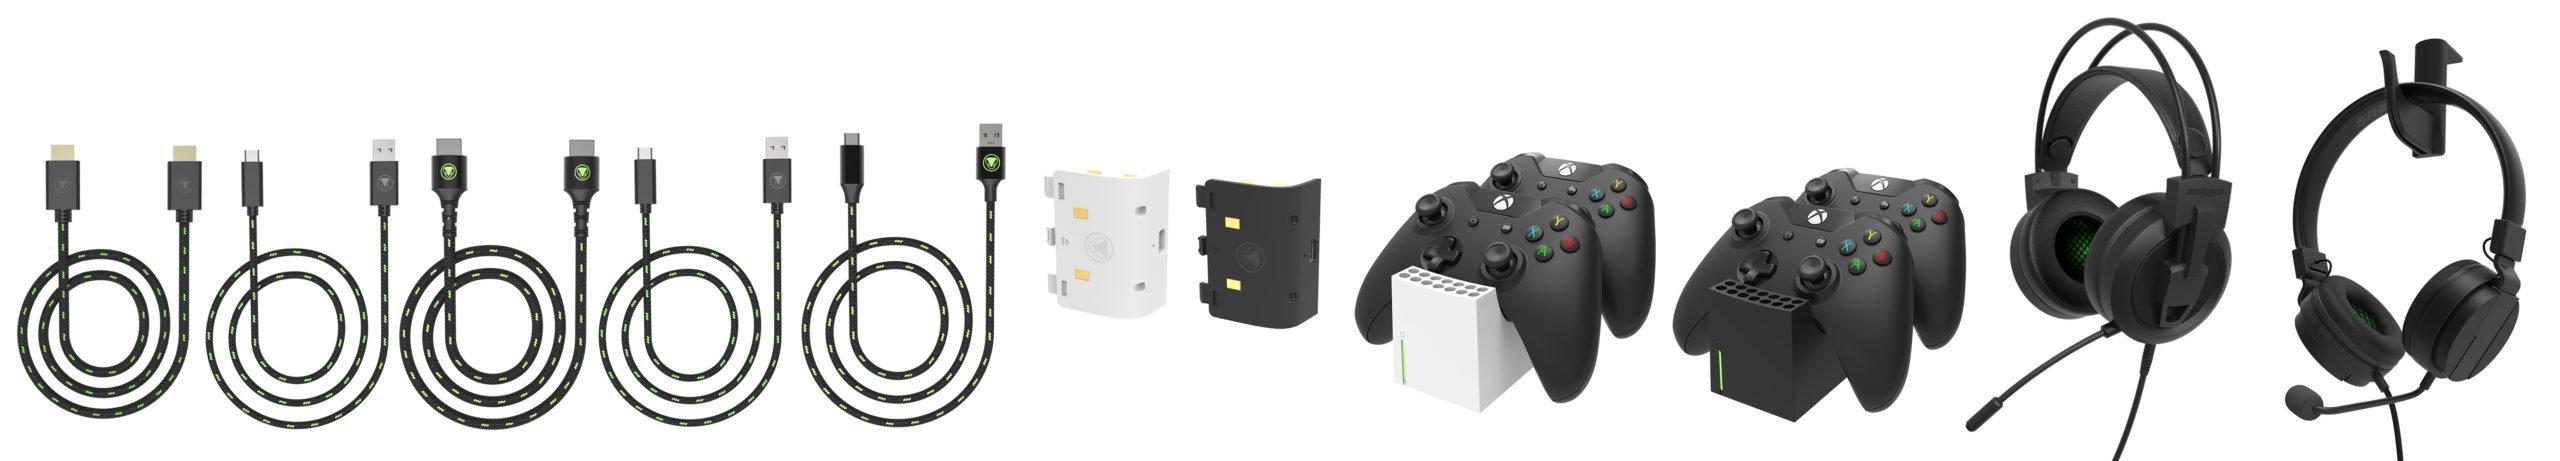 Snakebyte Xbox Produkte